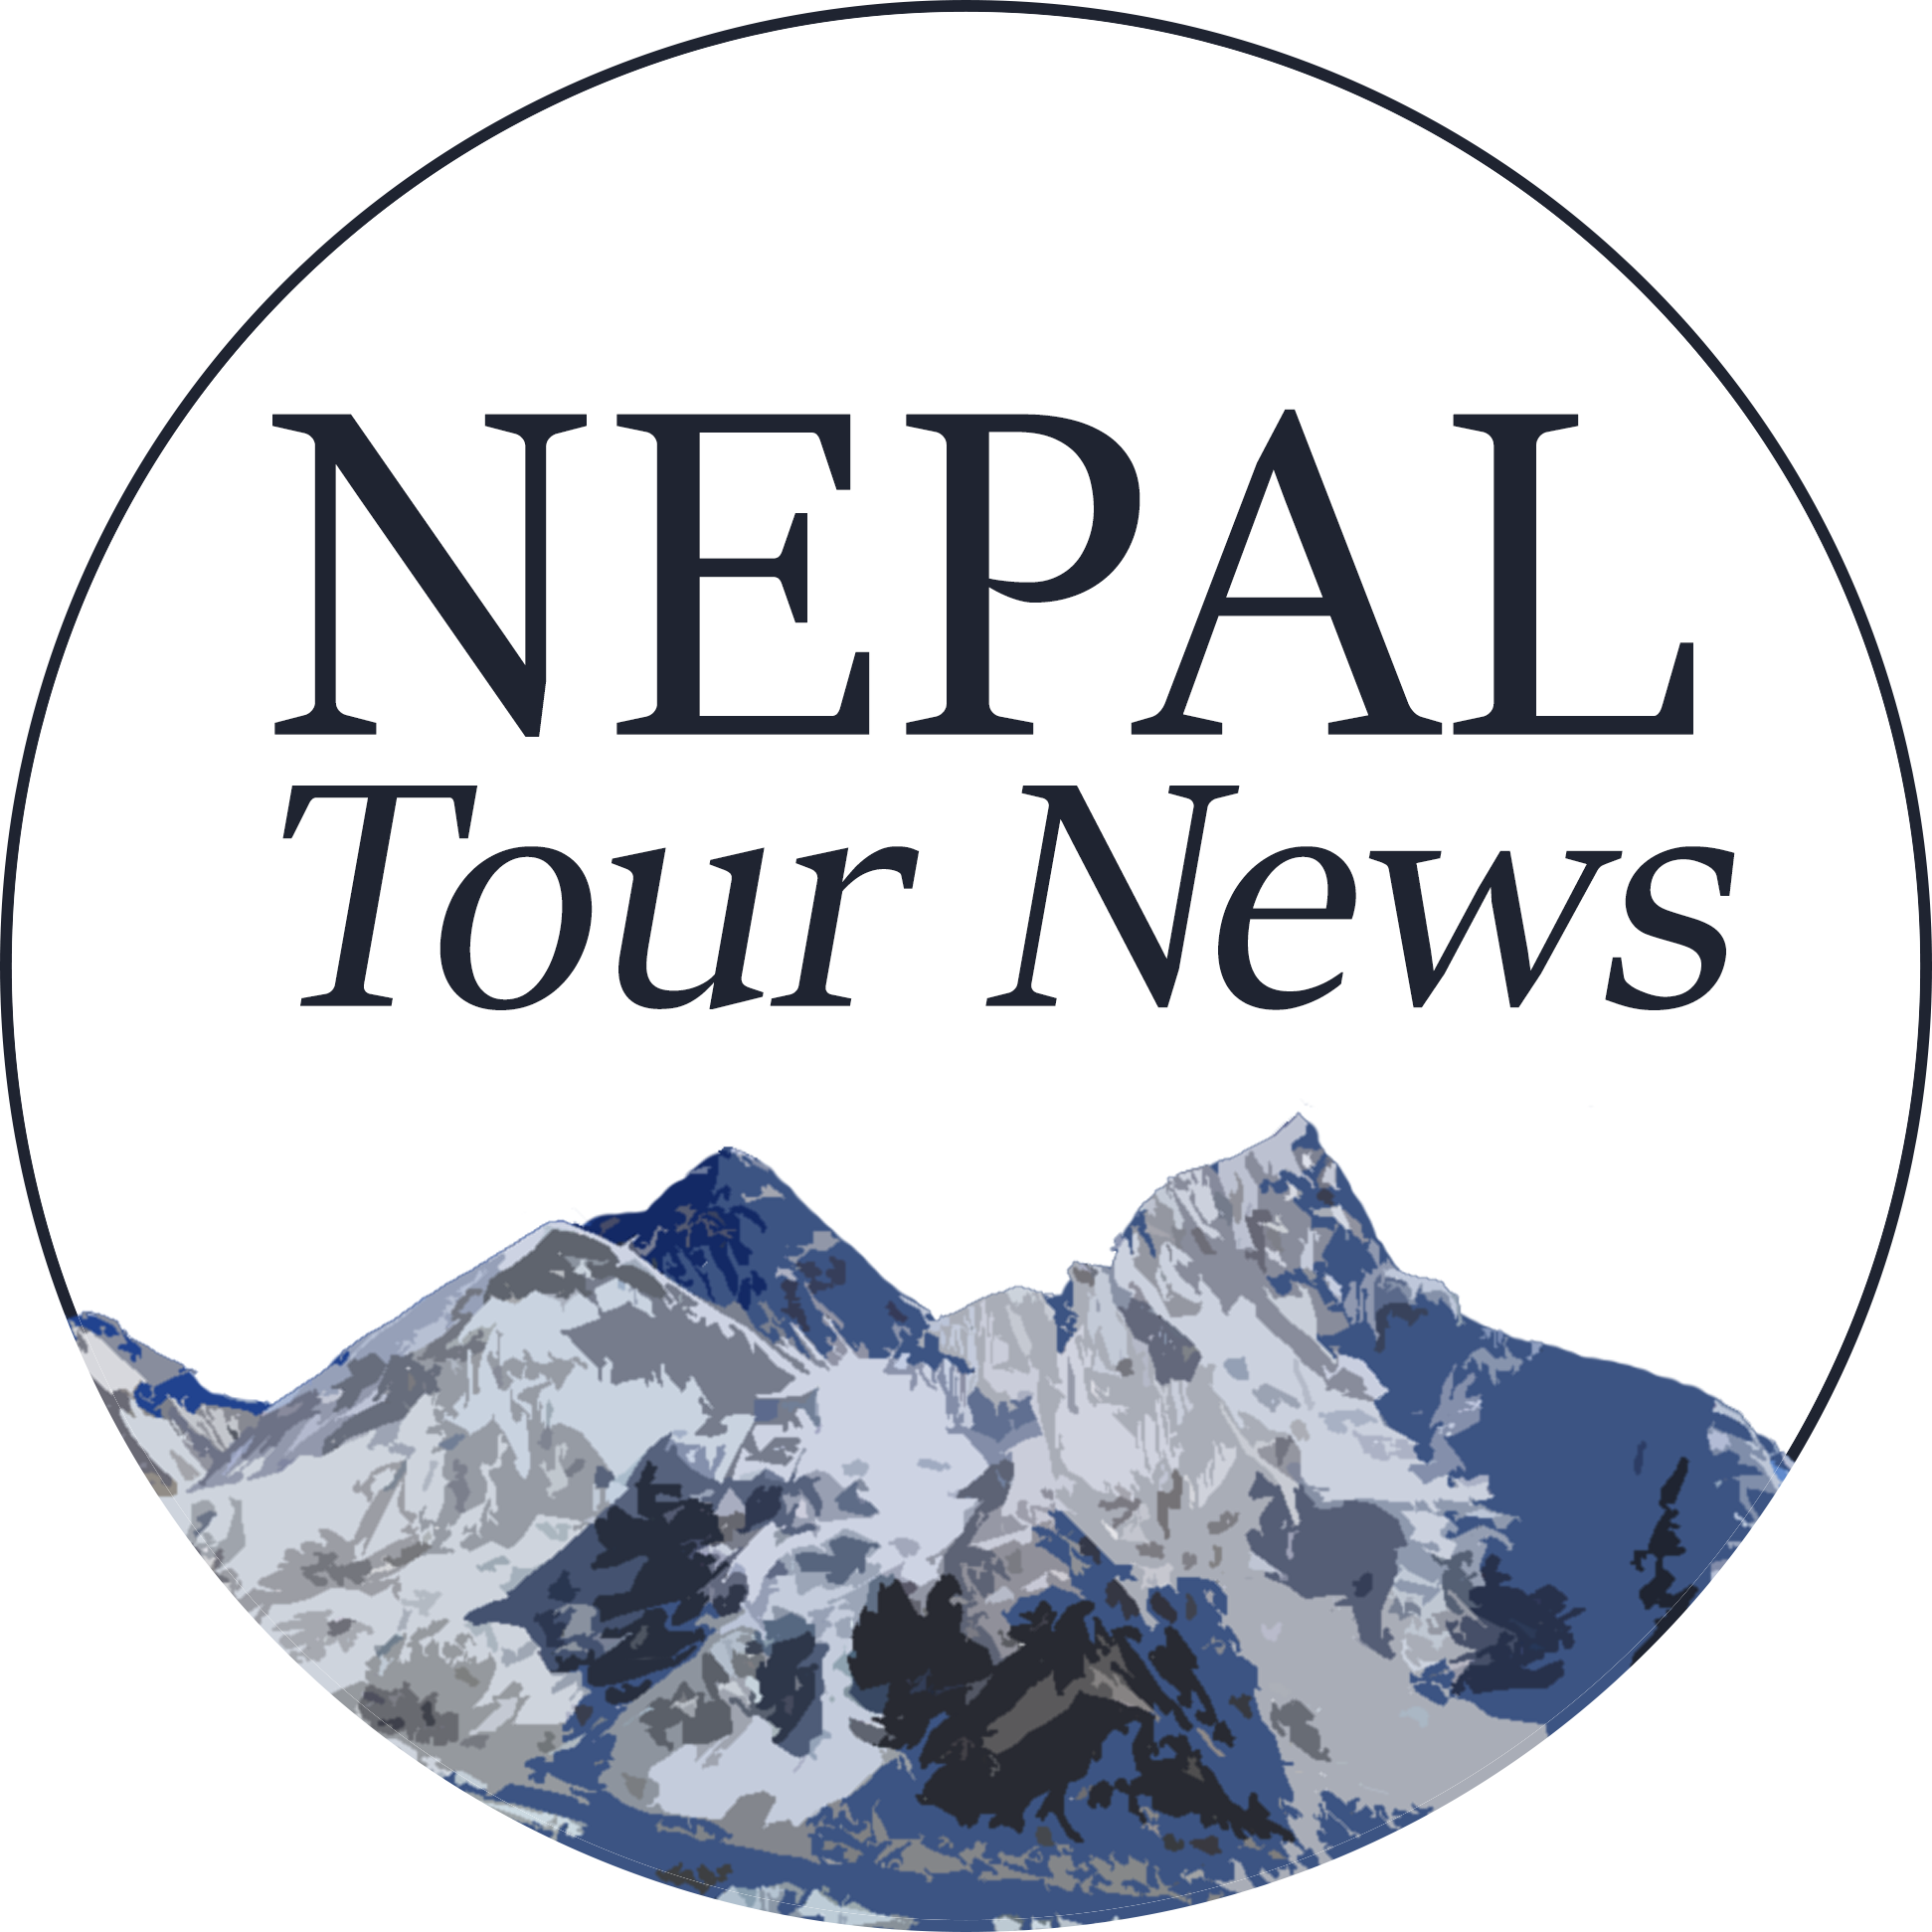 Nepal Tour News